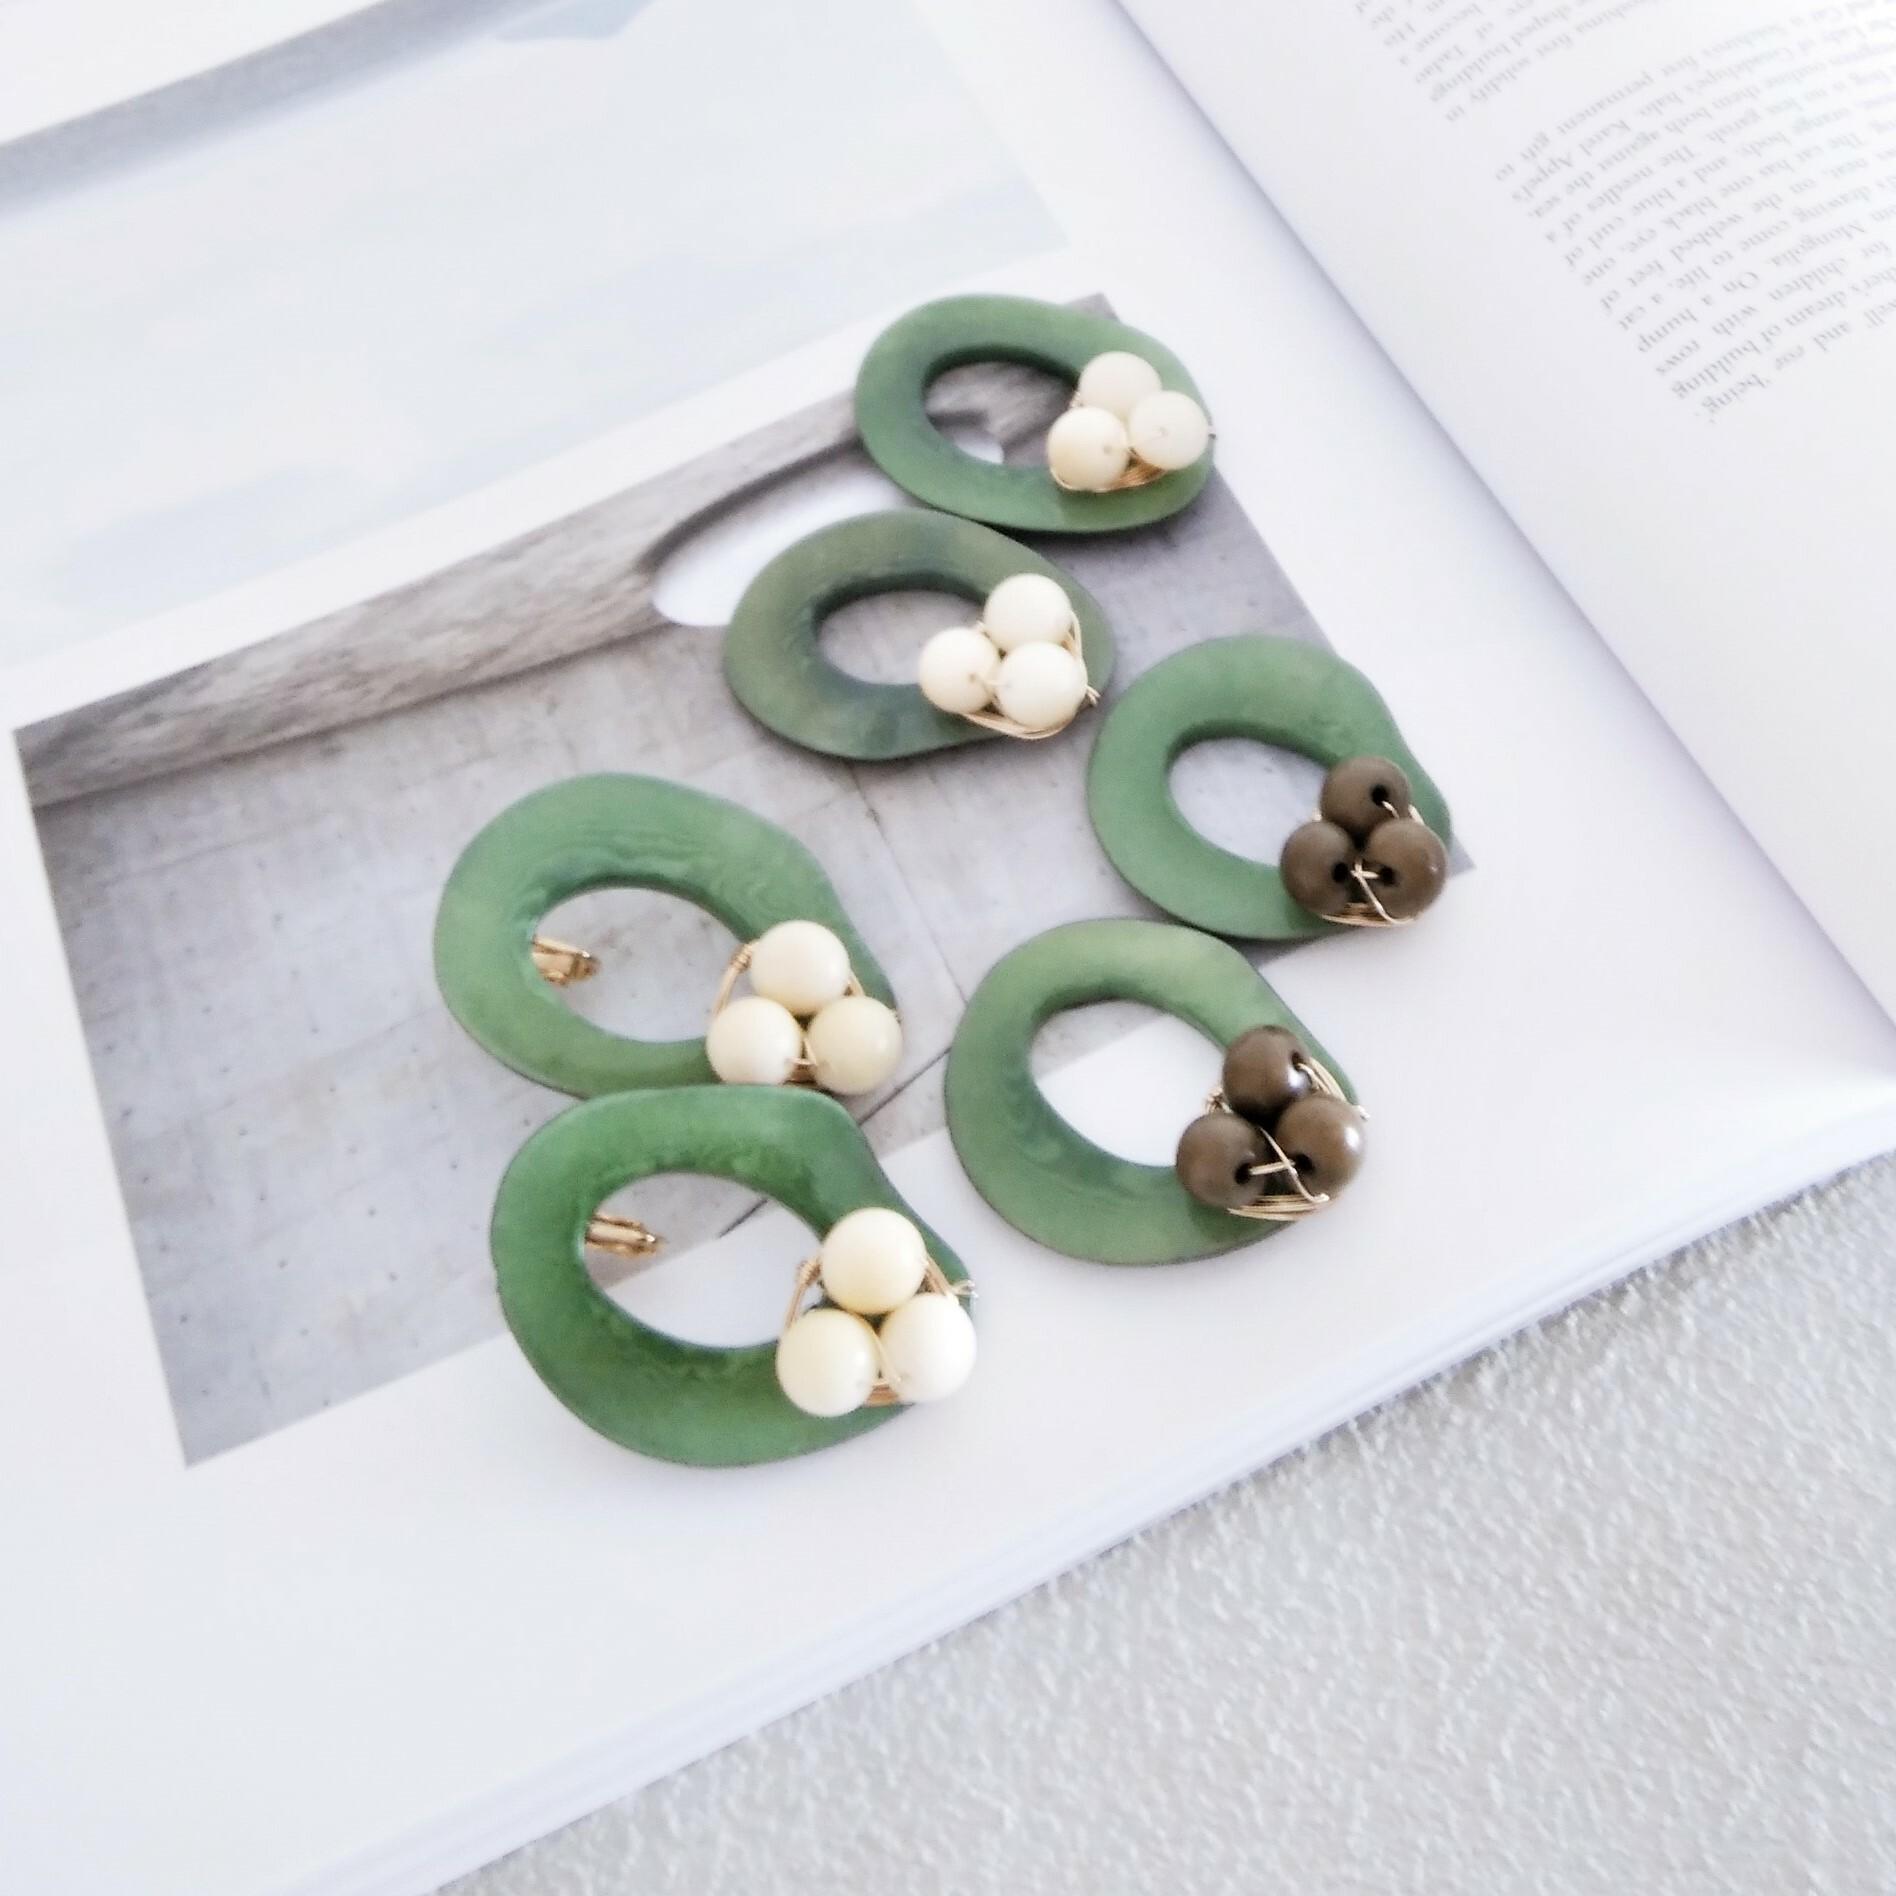 送料無料14kgf*Khaki x Ivory Tagua Nuts pierced earring/earring